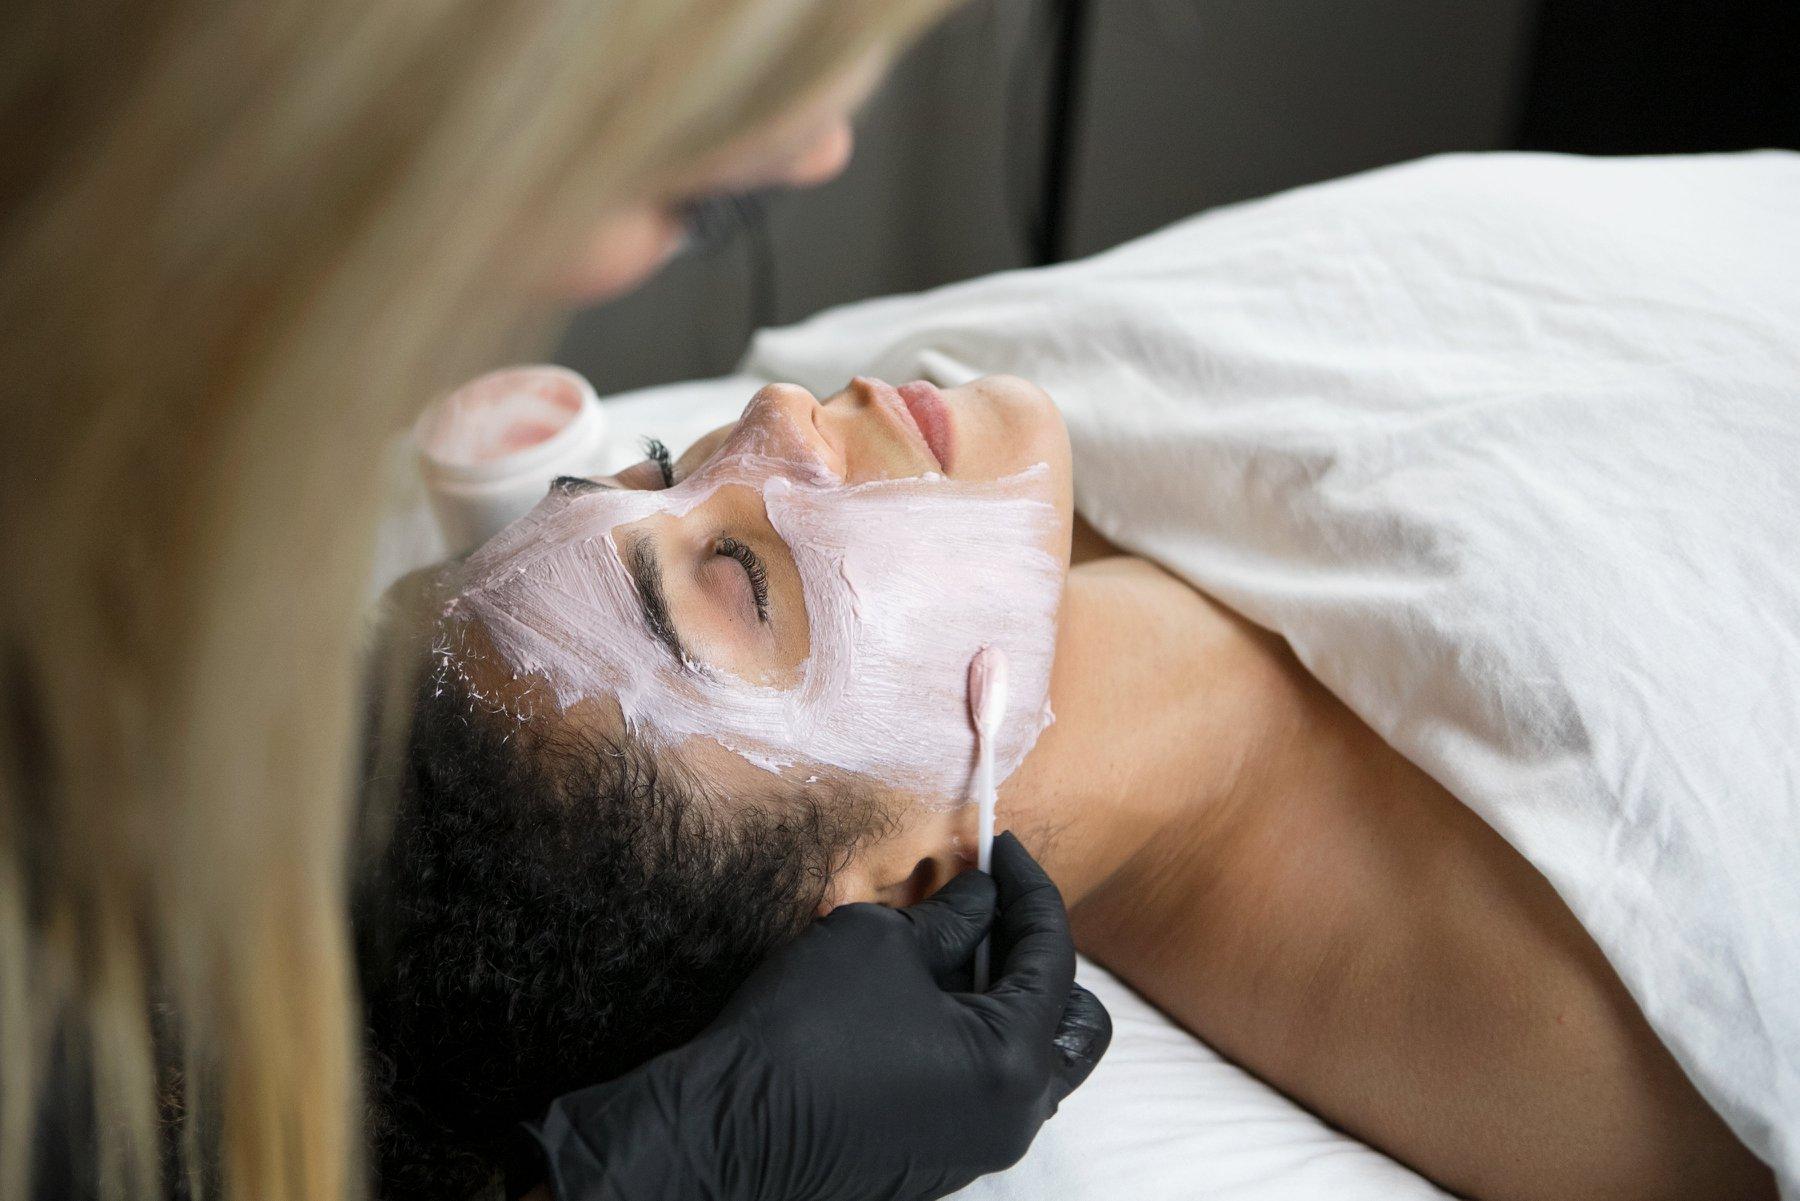 acacia spa springfield missouri woman facial